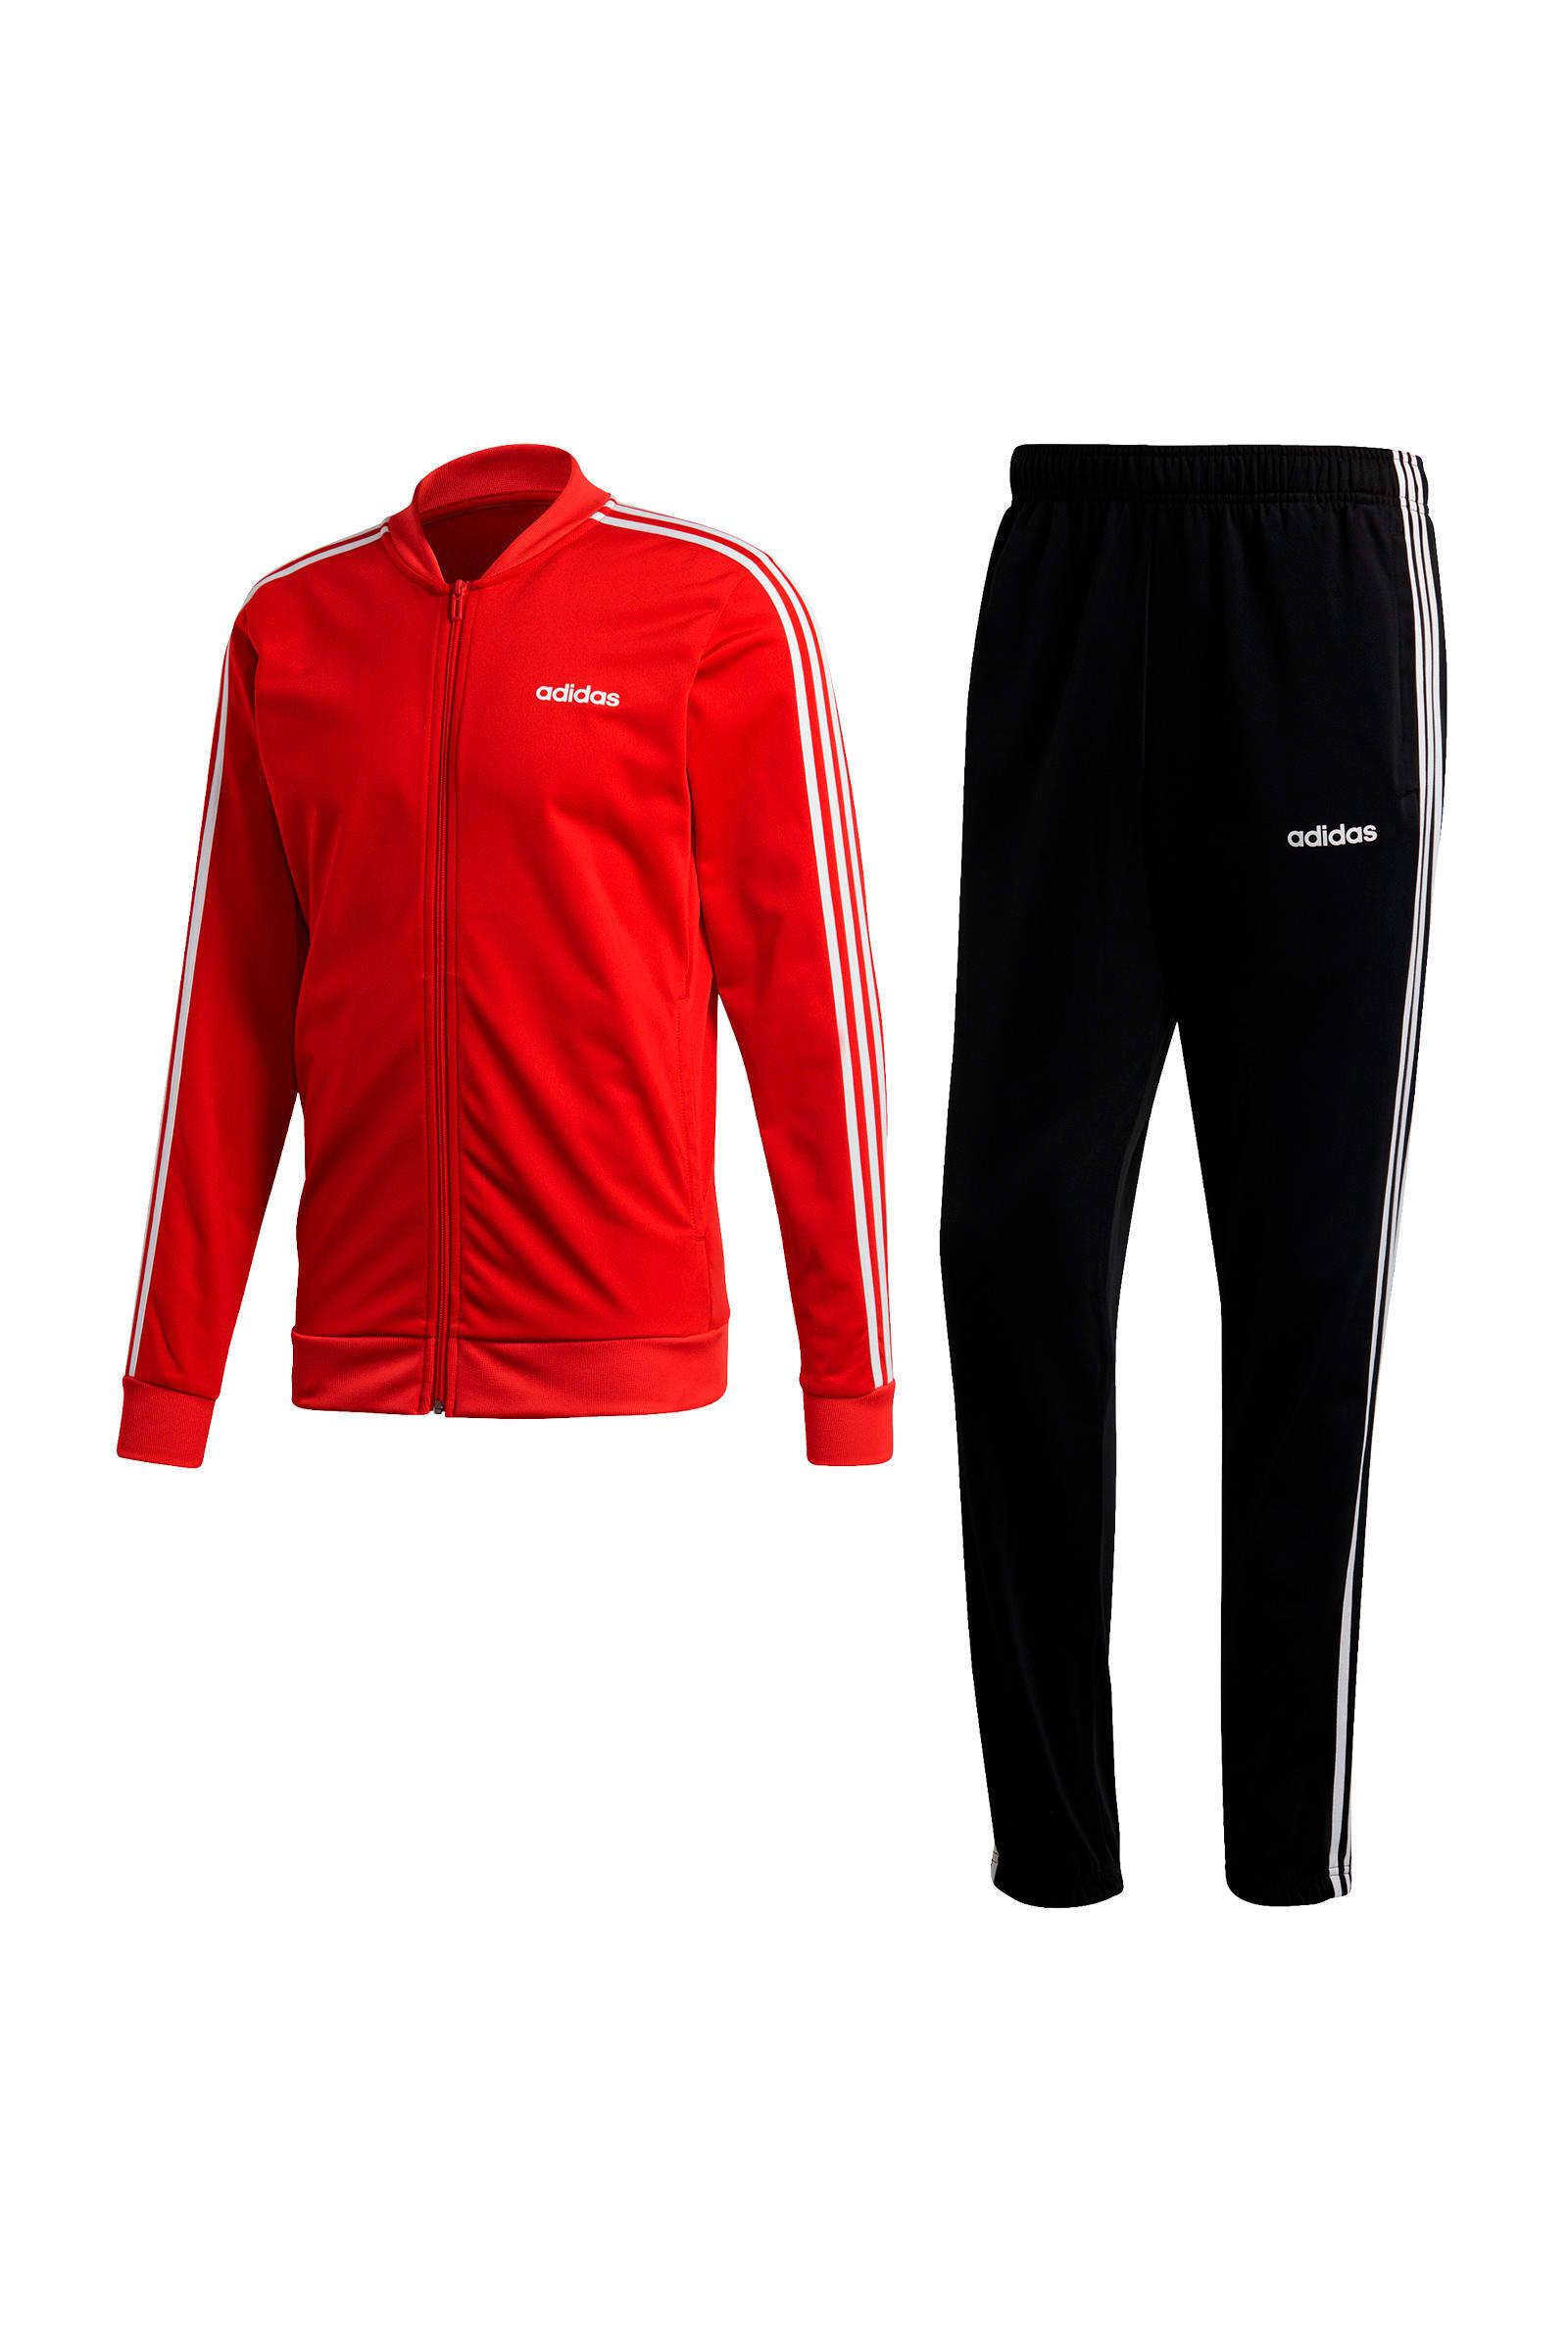 adidas Performance trainingspak roodzwart | wehkamp